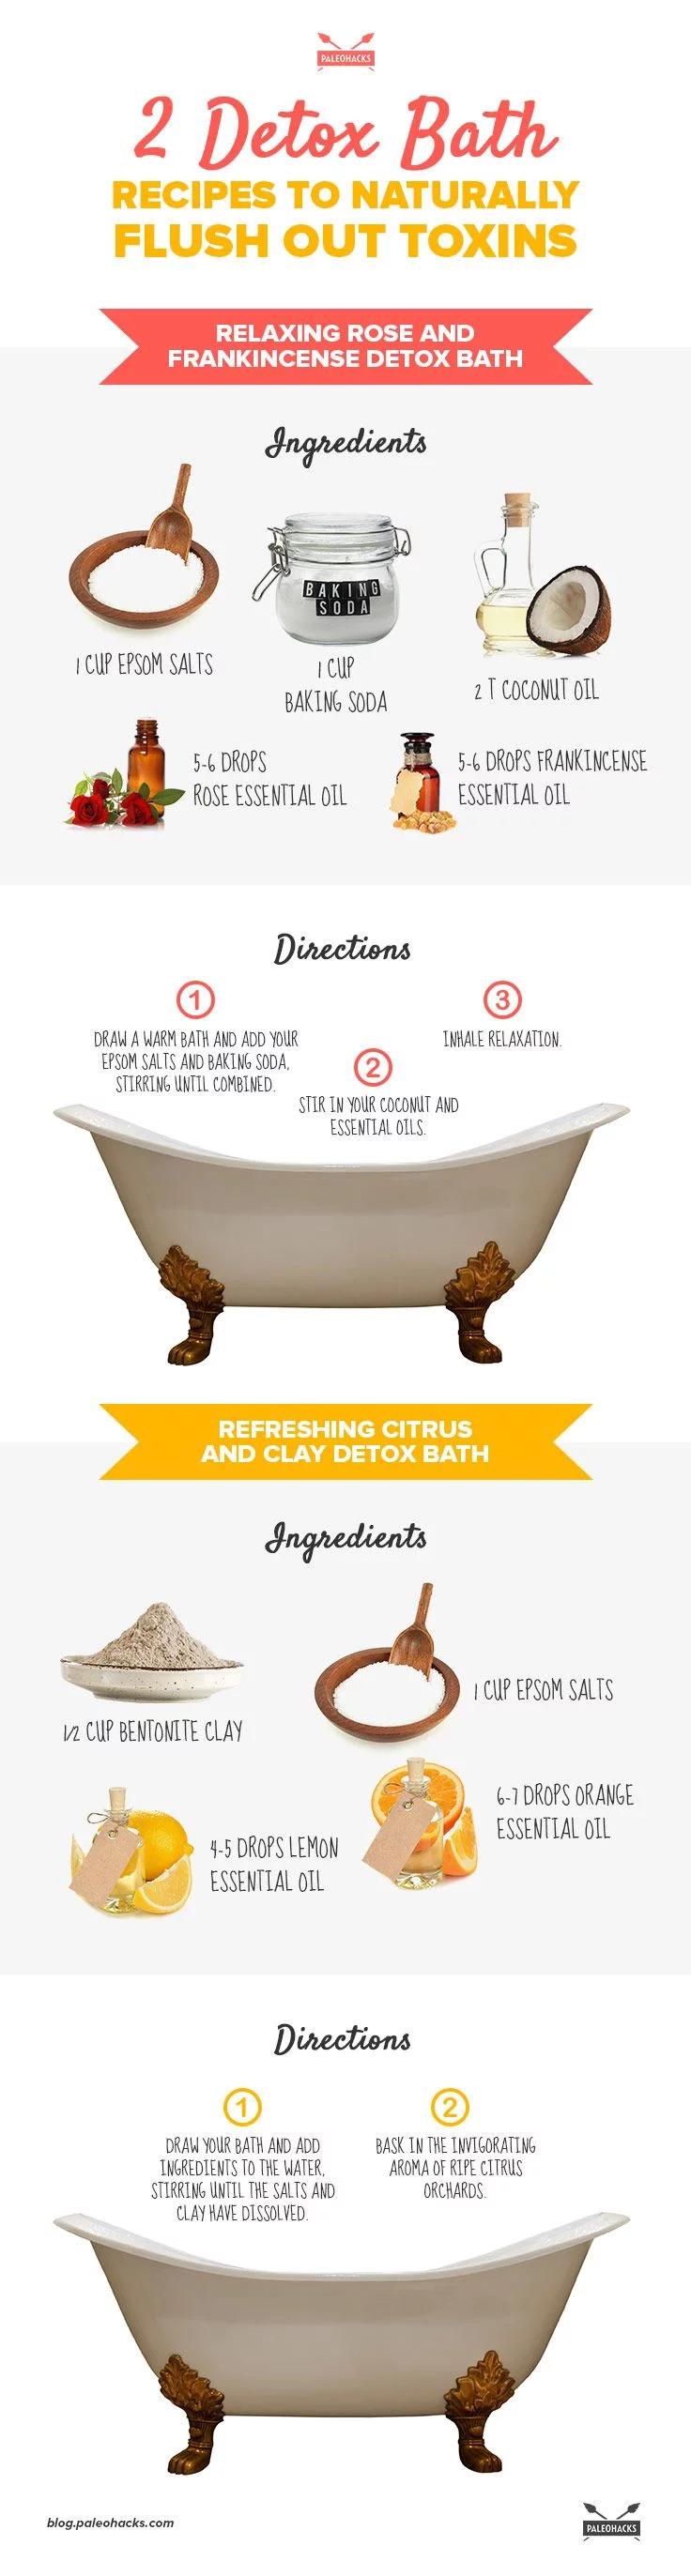 Detox Bath Recipes to Naturally Flush Out Toxins